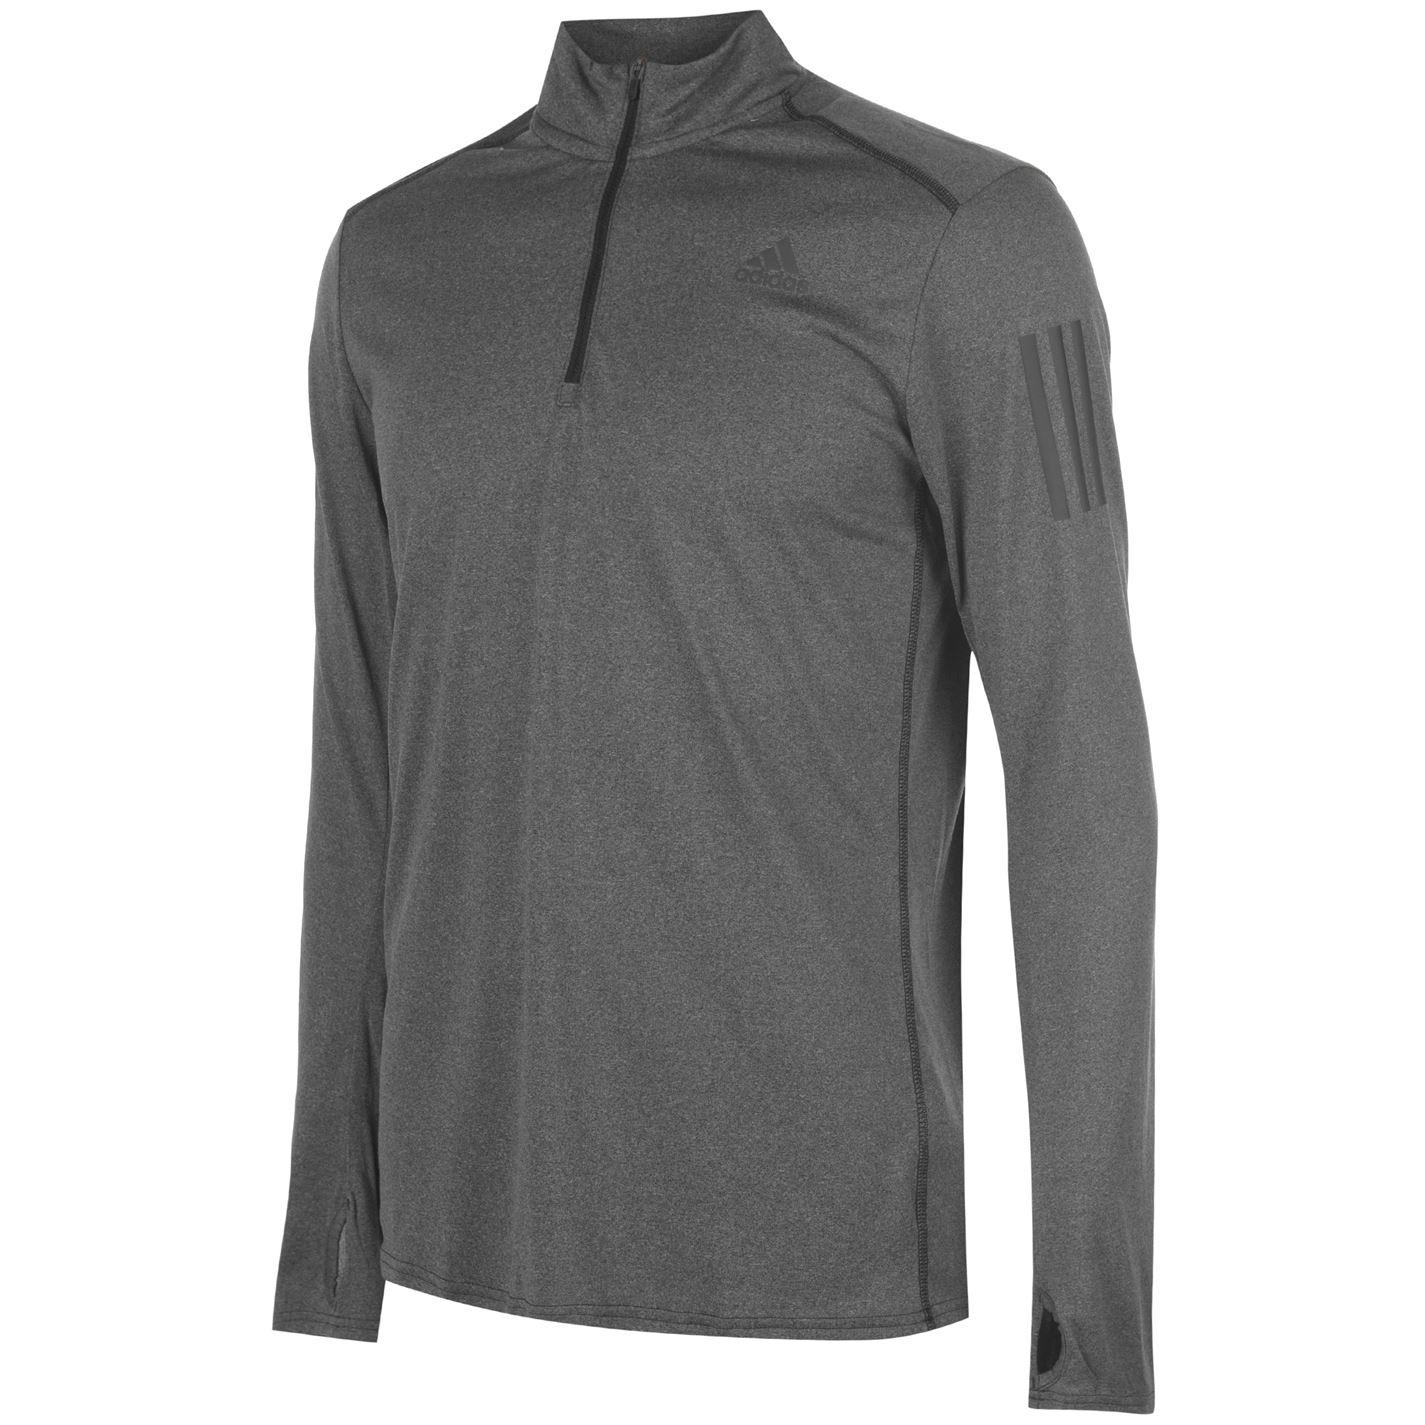 Nike Core Long Sleeve Mock Base Layer Top pánské